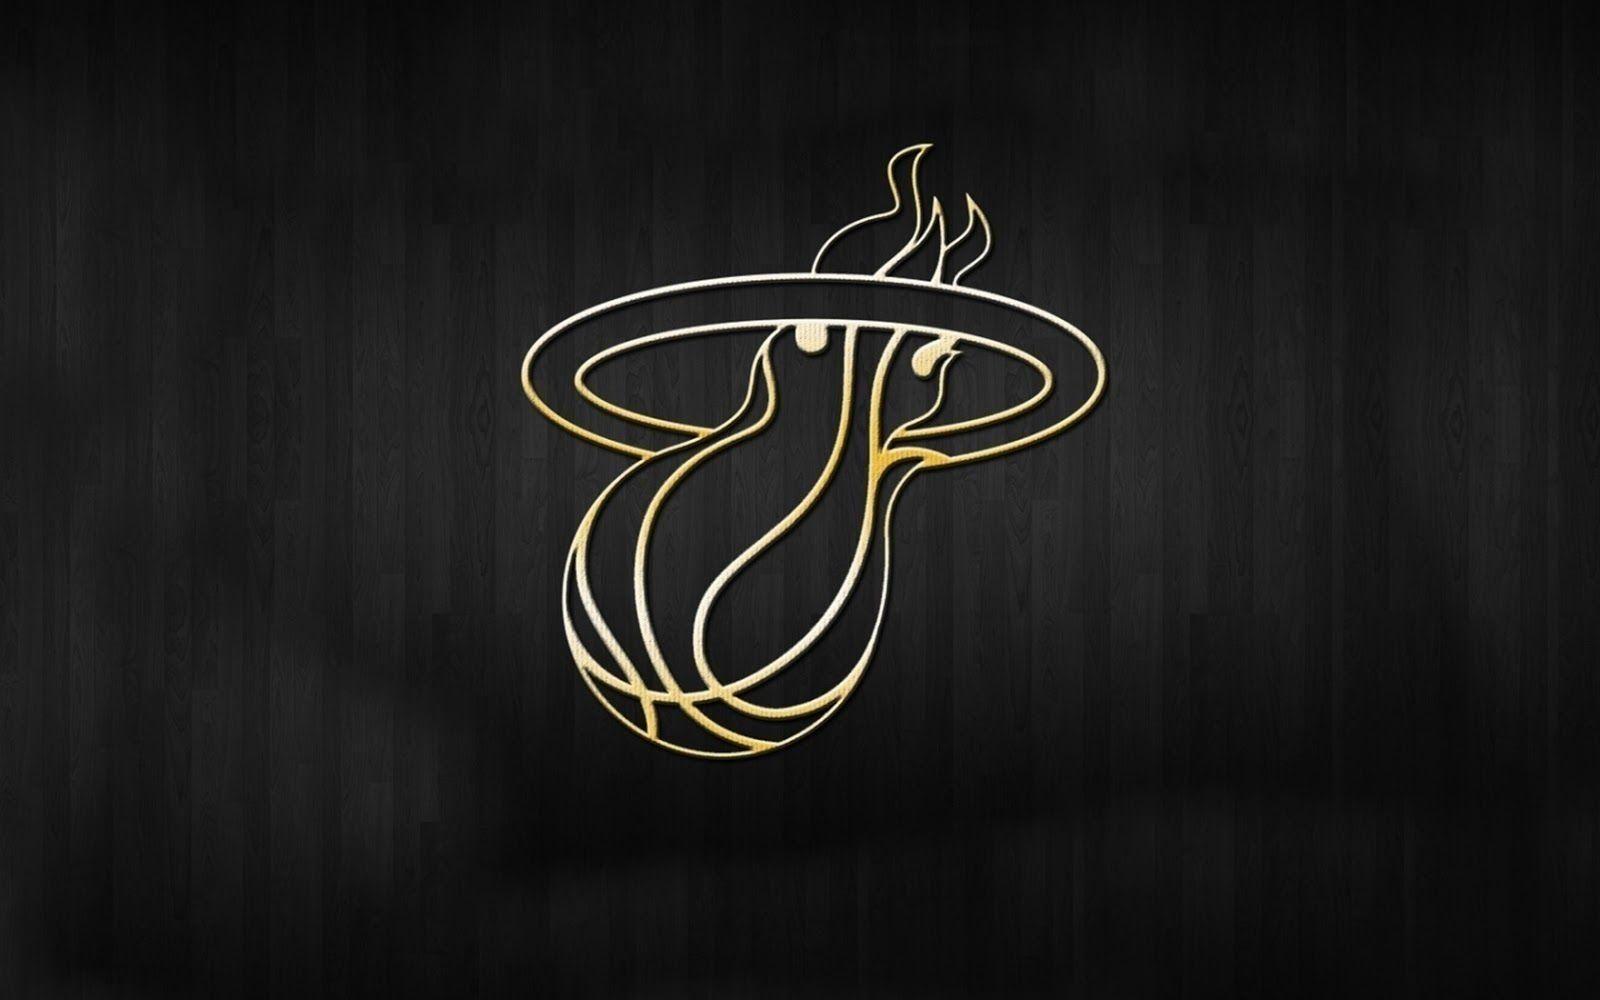 10 Most Popular Miami Heat Logo Wallpaper Full Hd 1080p For Pc Background Miami Heat Logo Miami Heat Basketball Wallpapers Hd